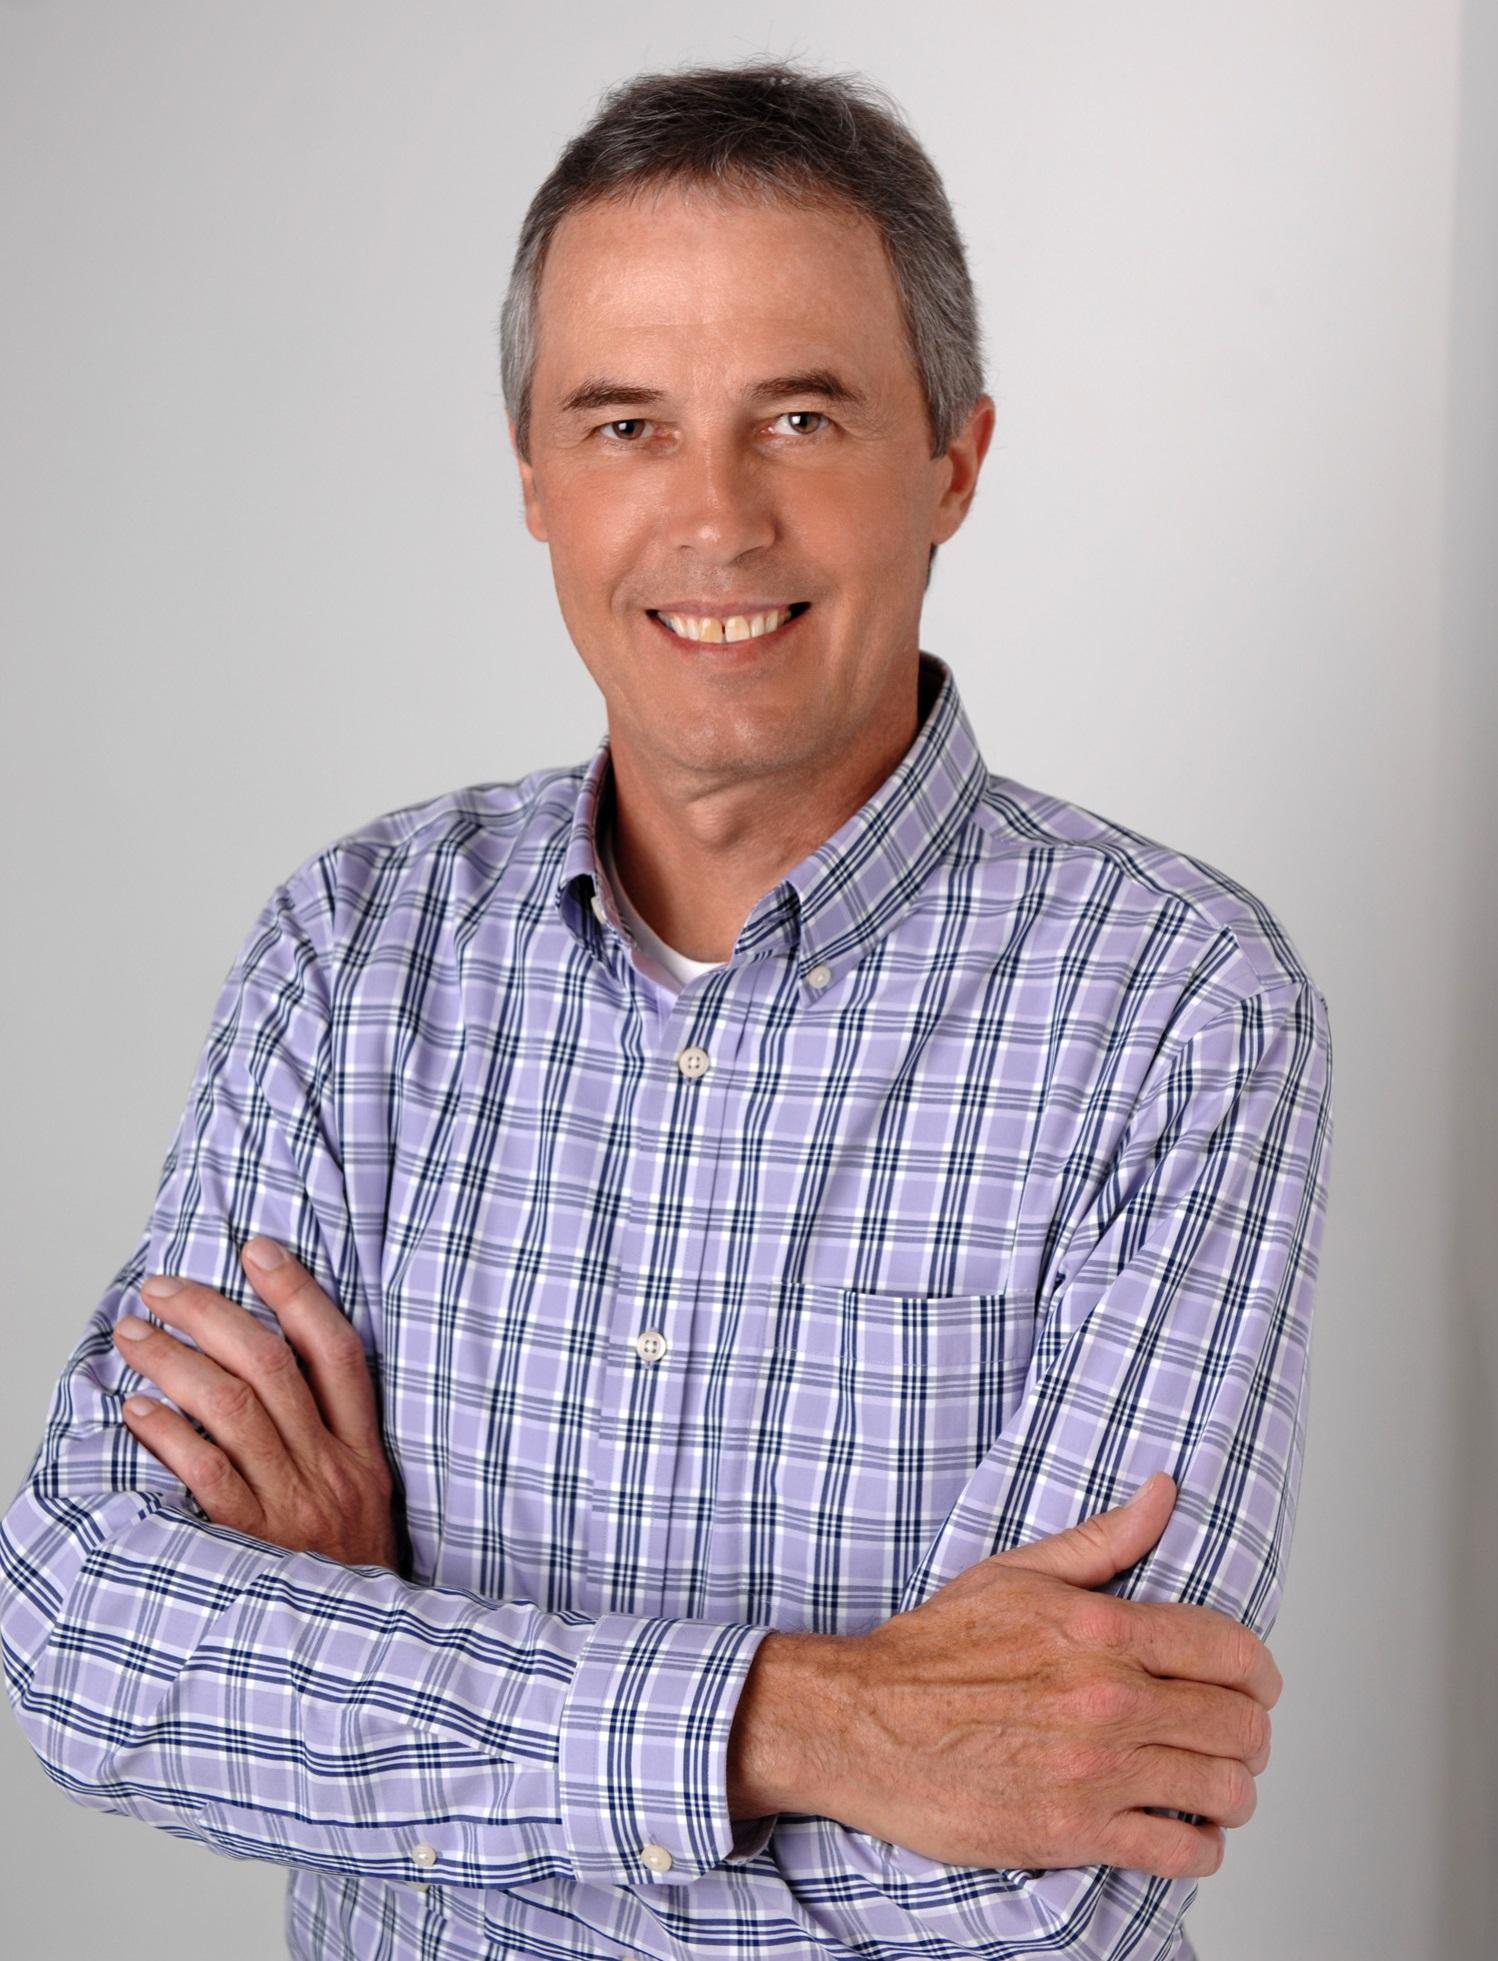 New Ulm Chiropractor, Dr. Steve Hawkins